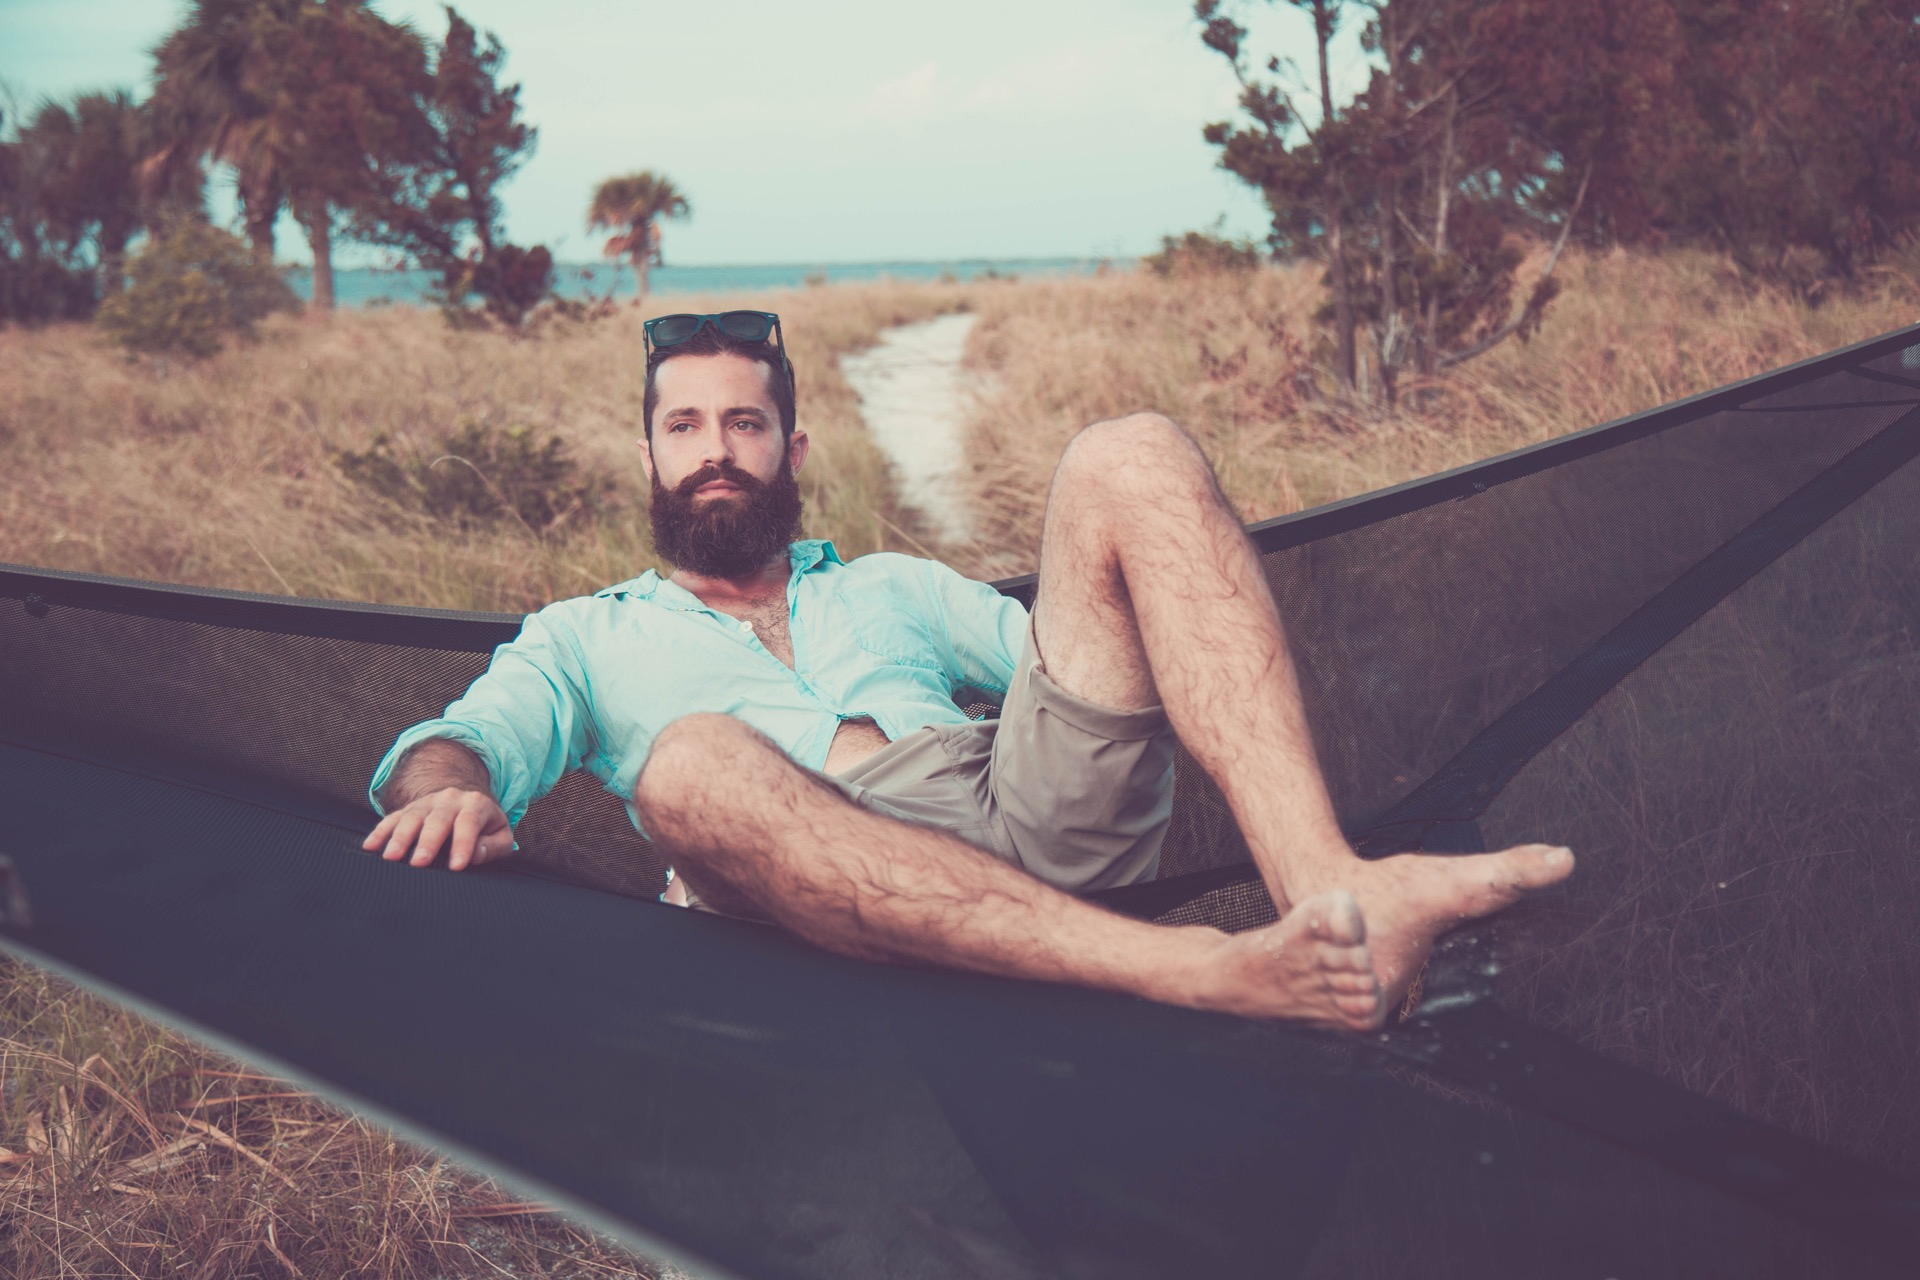 Tentstile hammock on an island